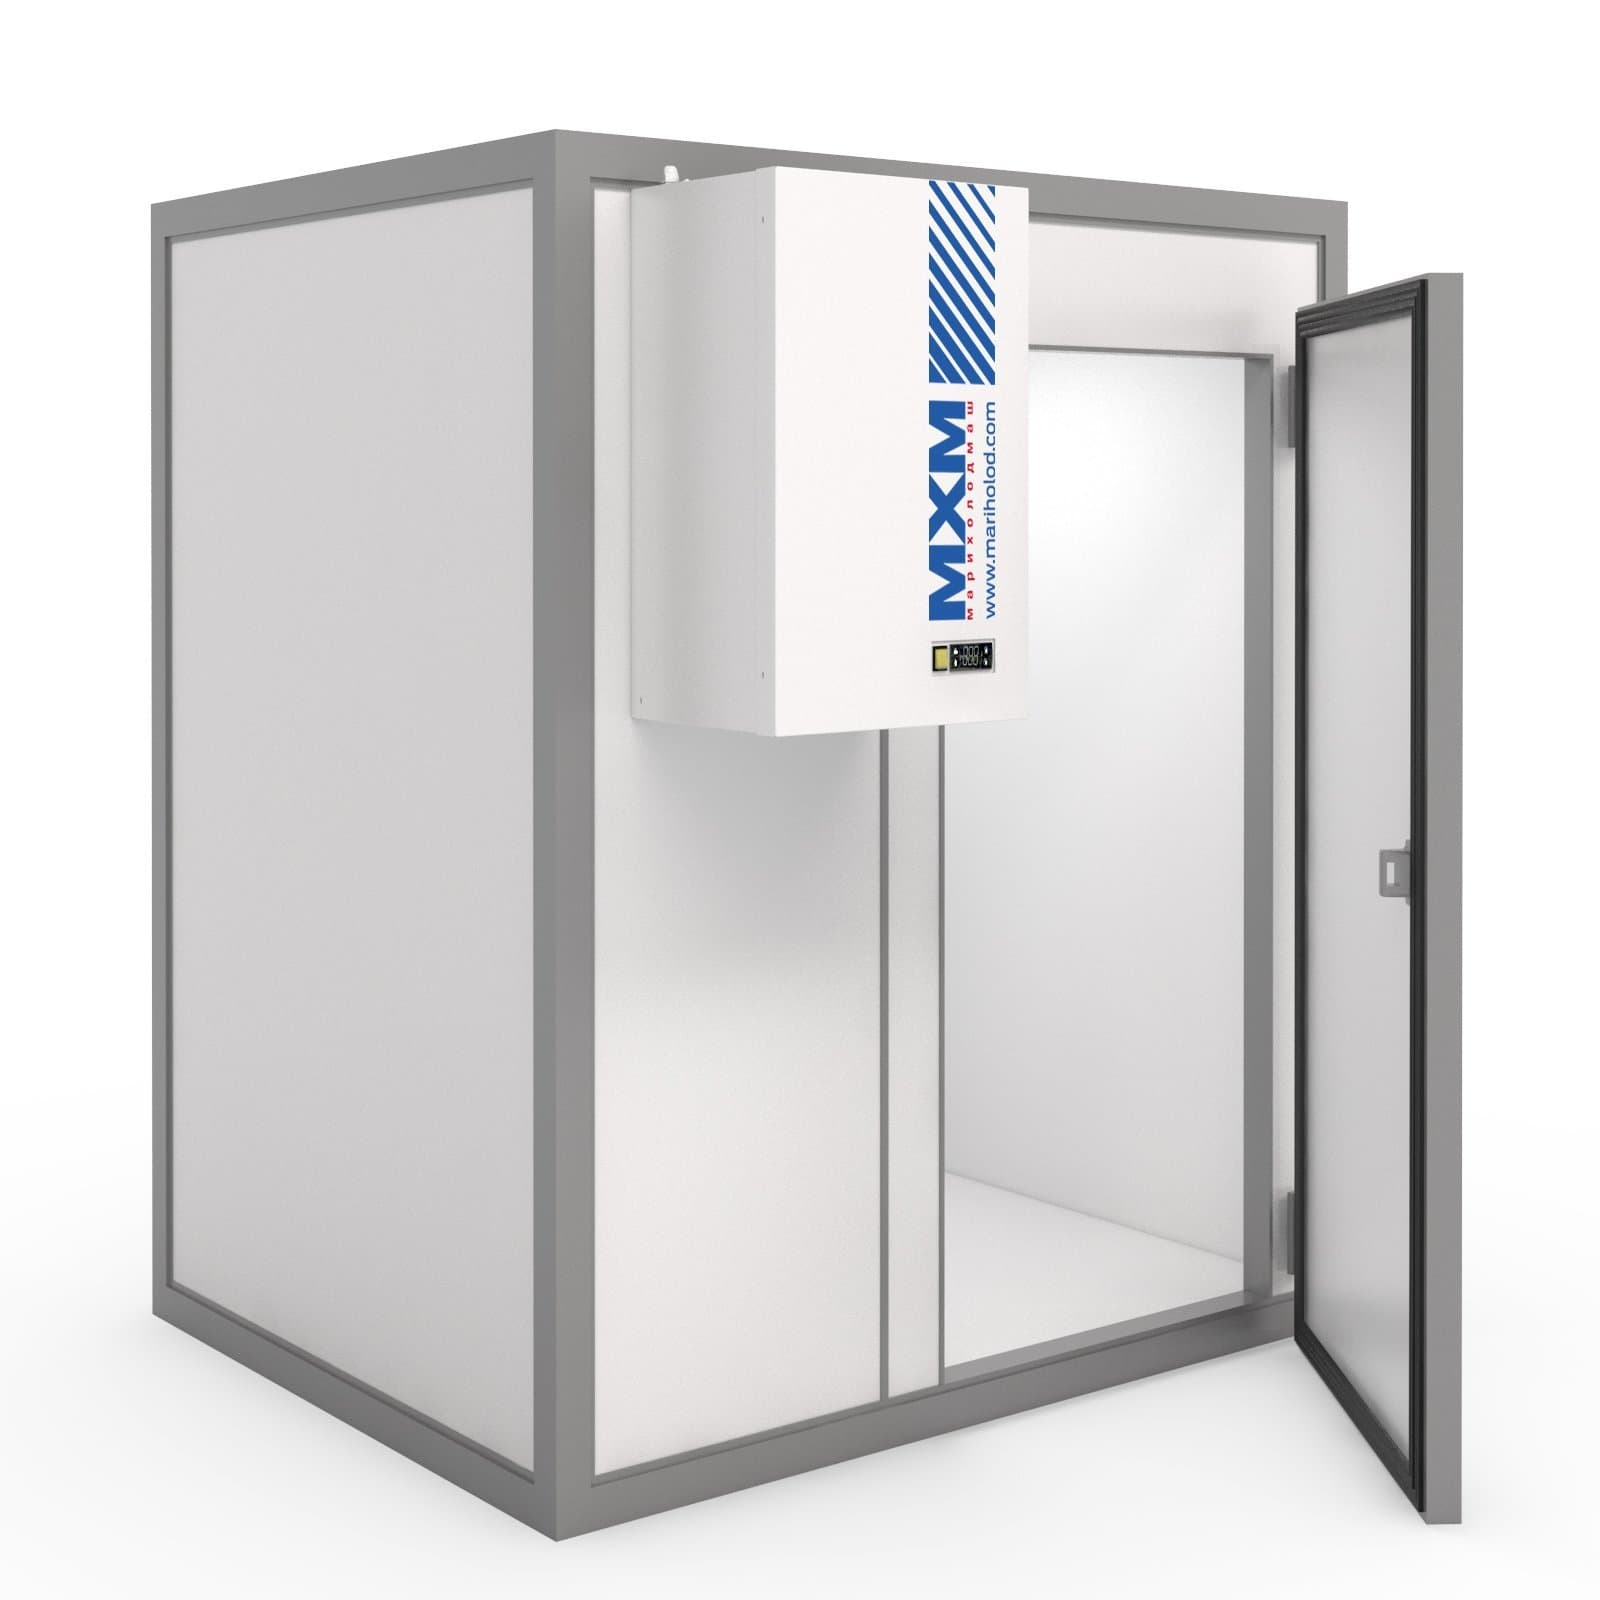 Камера холодильная МХМ КХН-8,29 1360×2860×2720